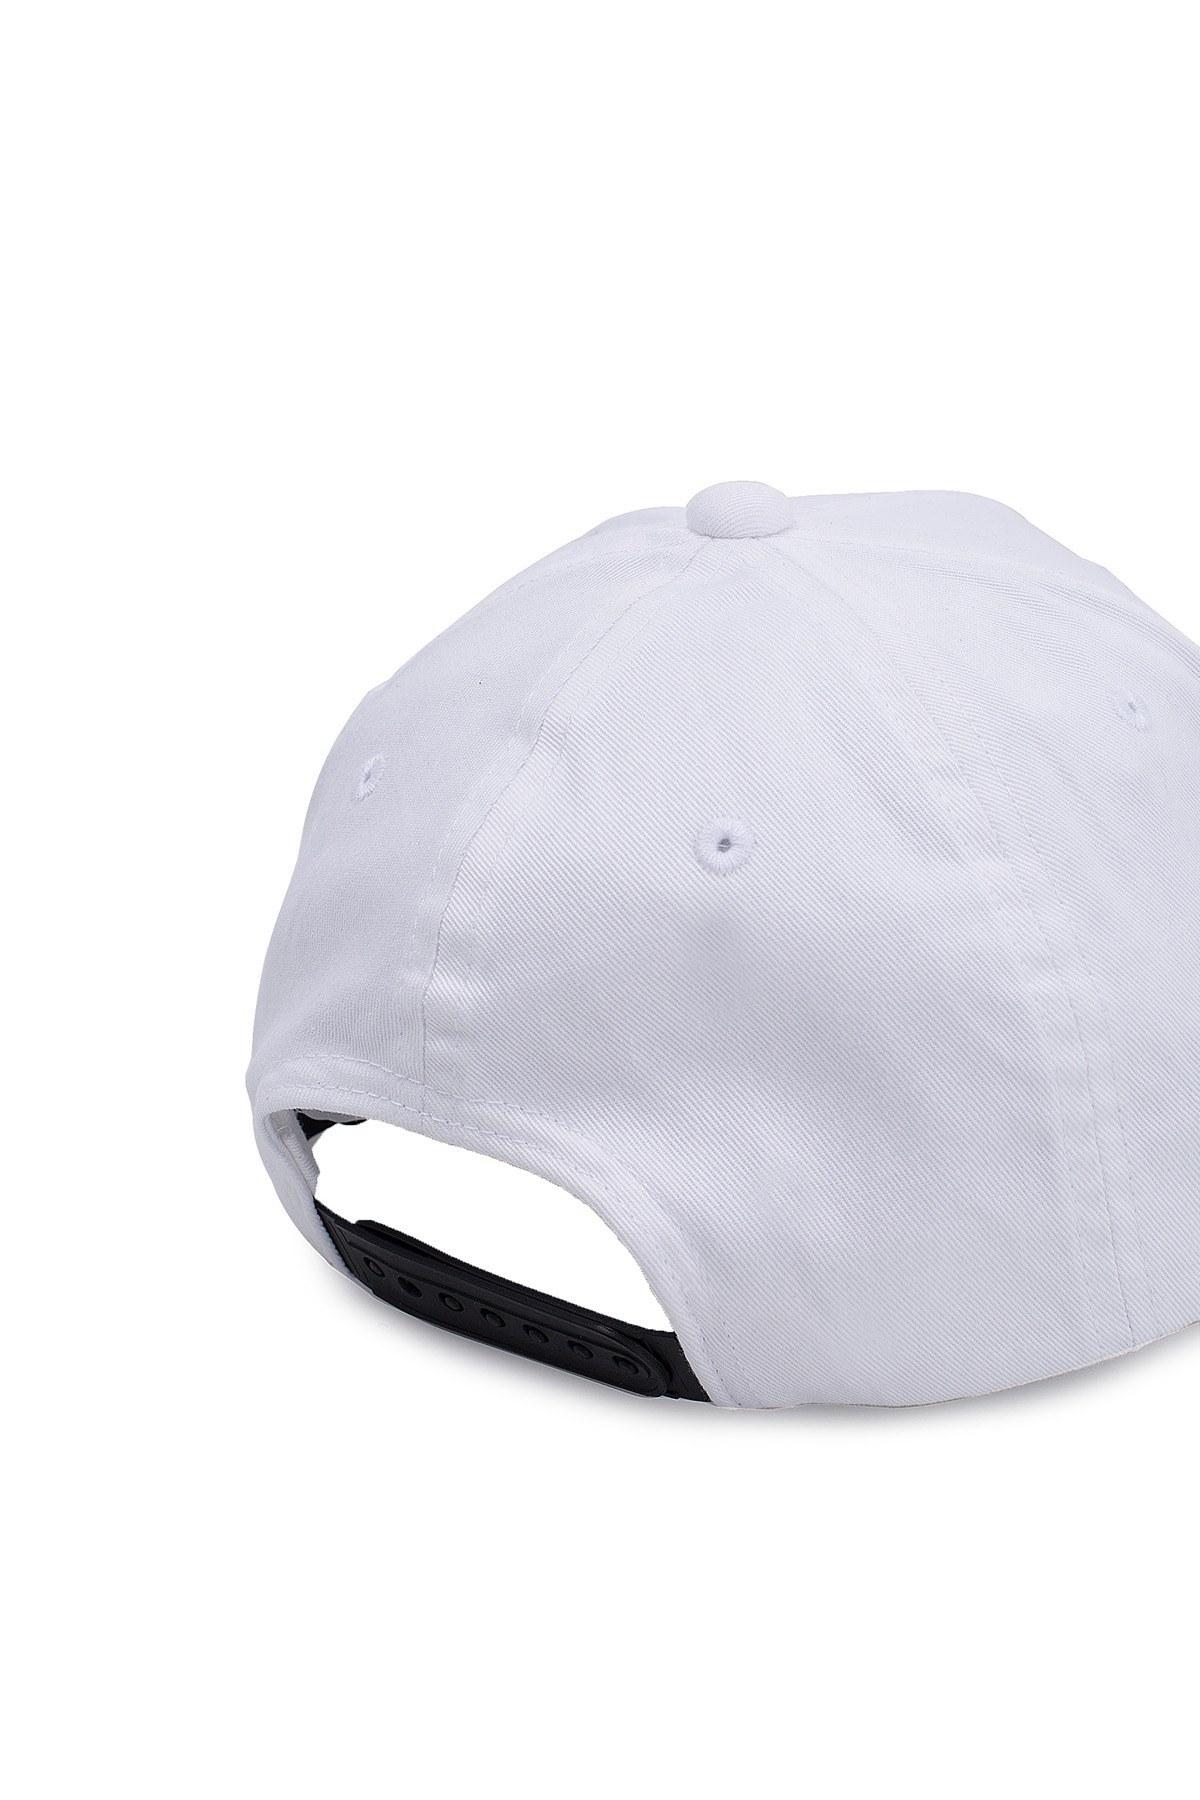 EA7 Erkek Şapka S 275868 9P510 00010 BEYAZ